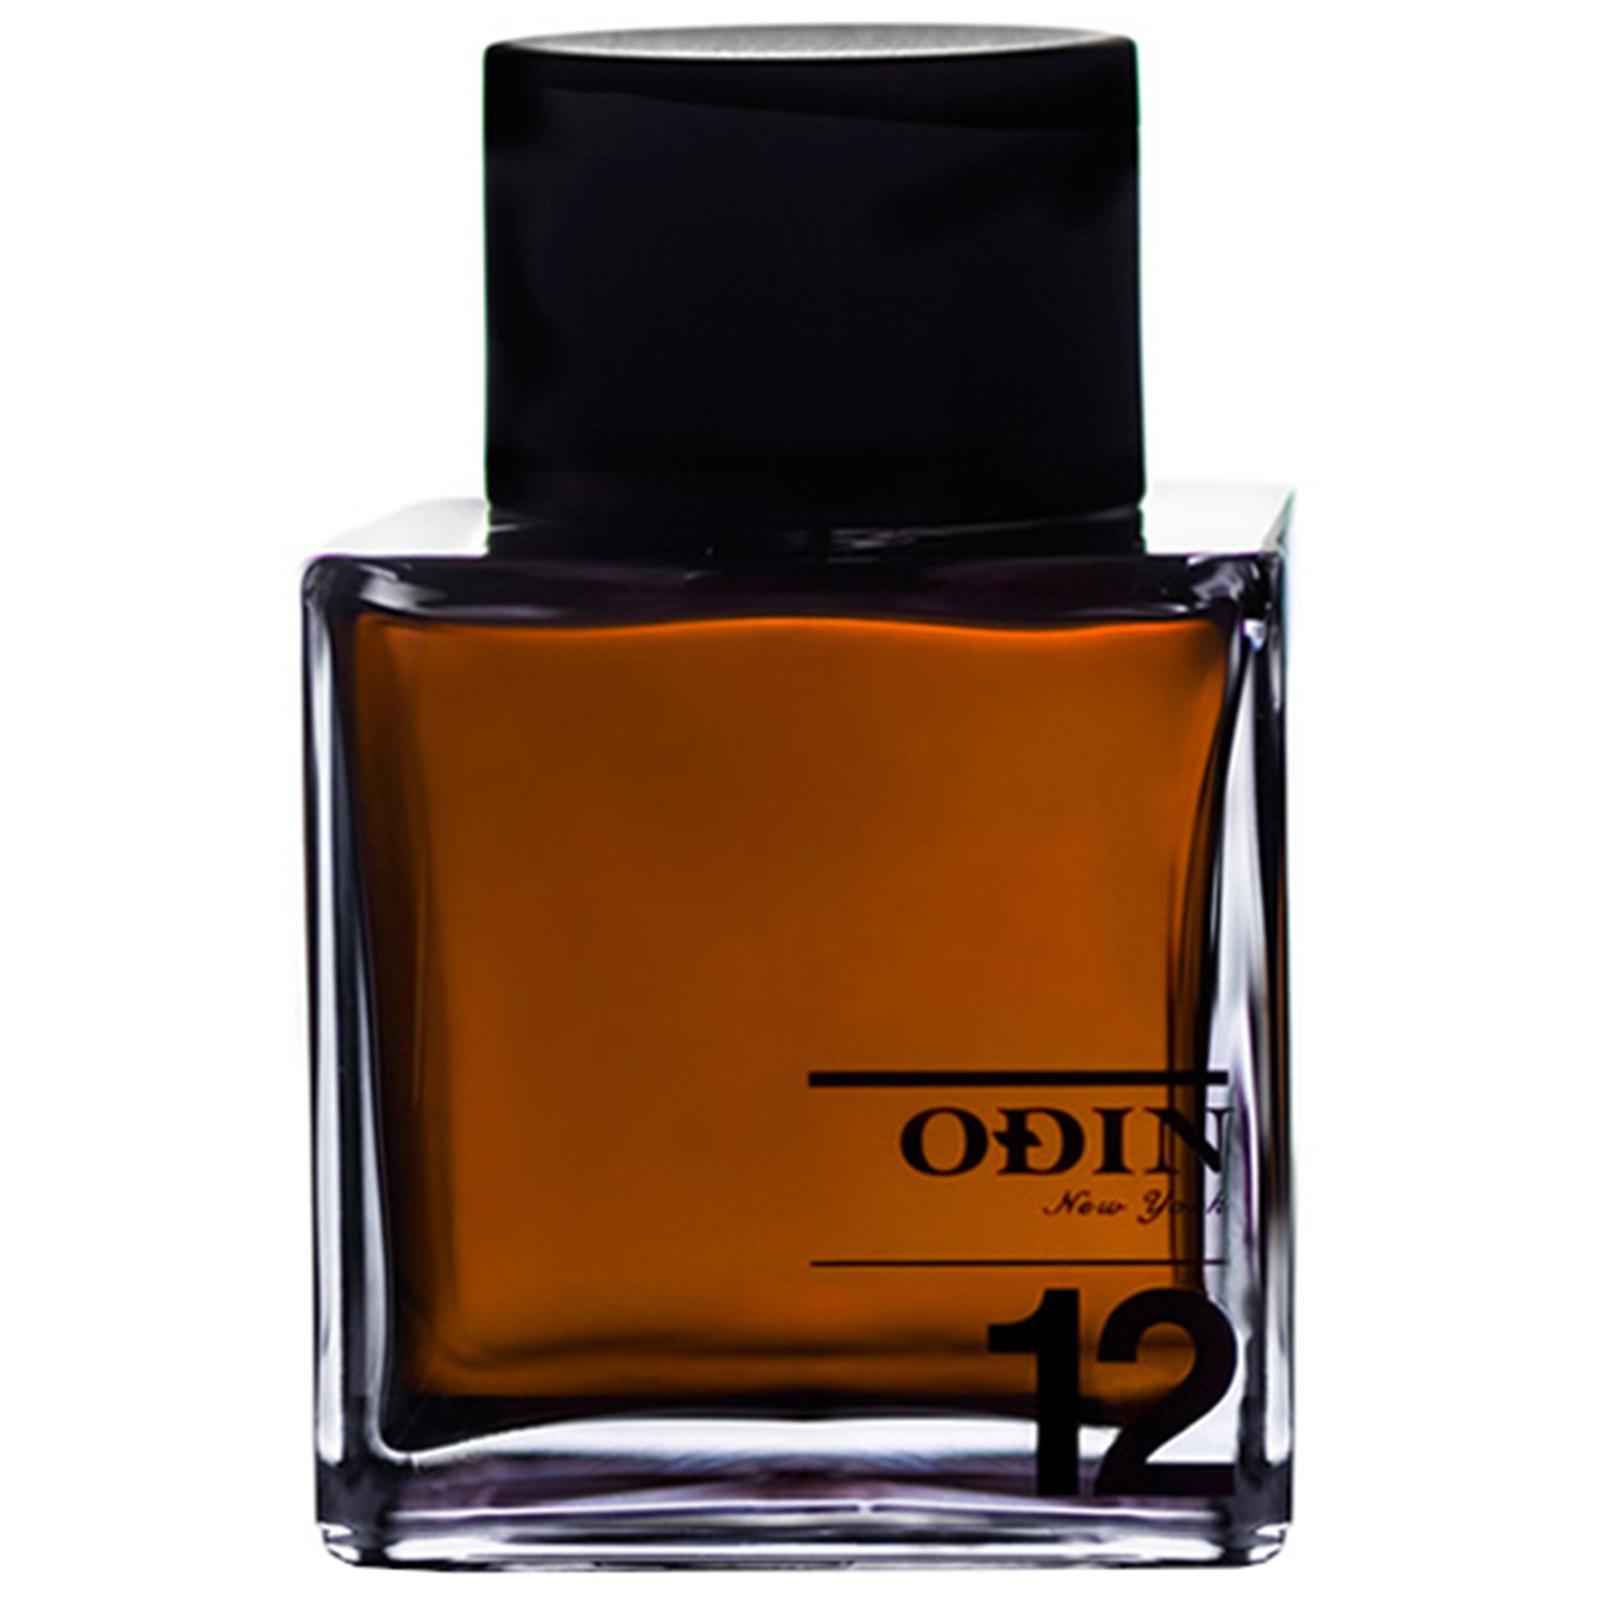 12 lacha profumo eau de parfum 100 ml